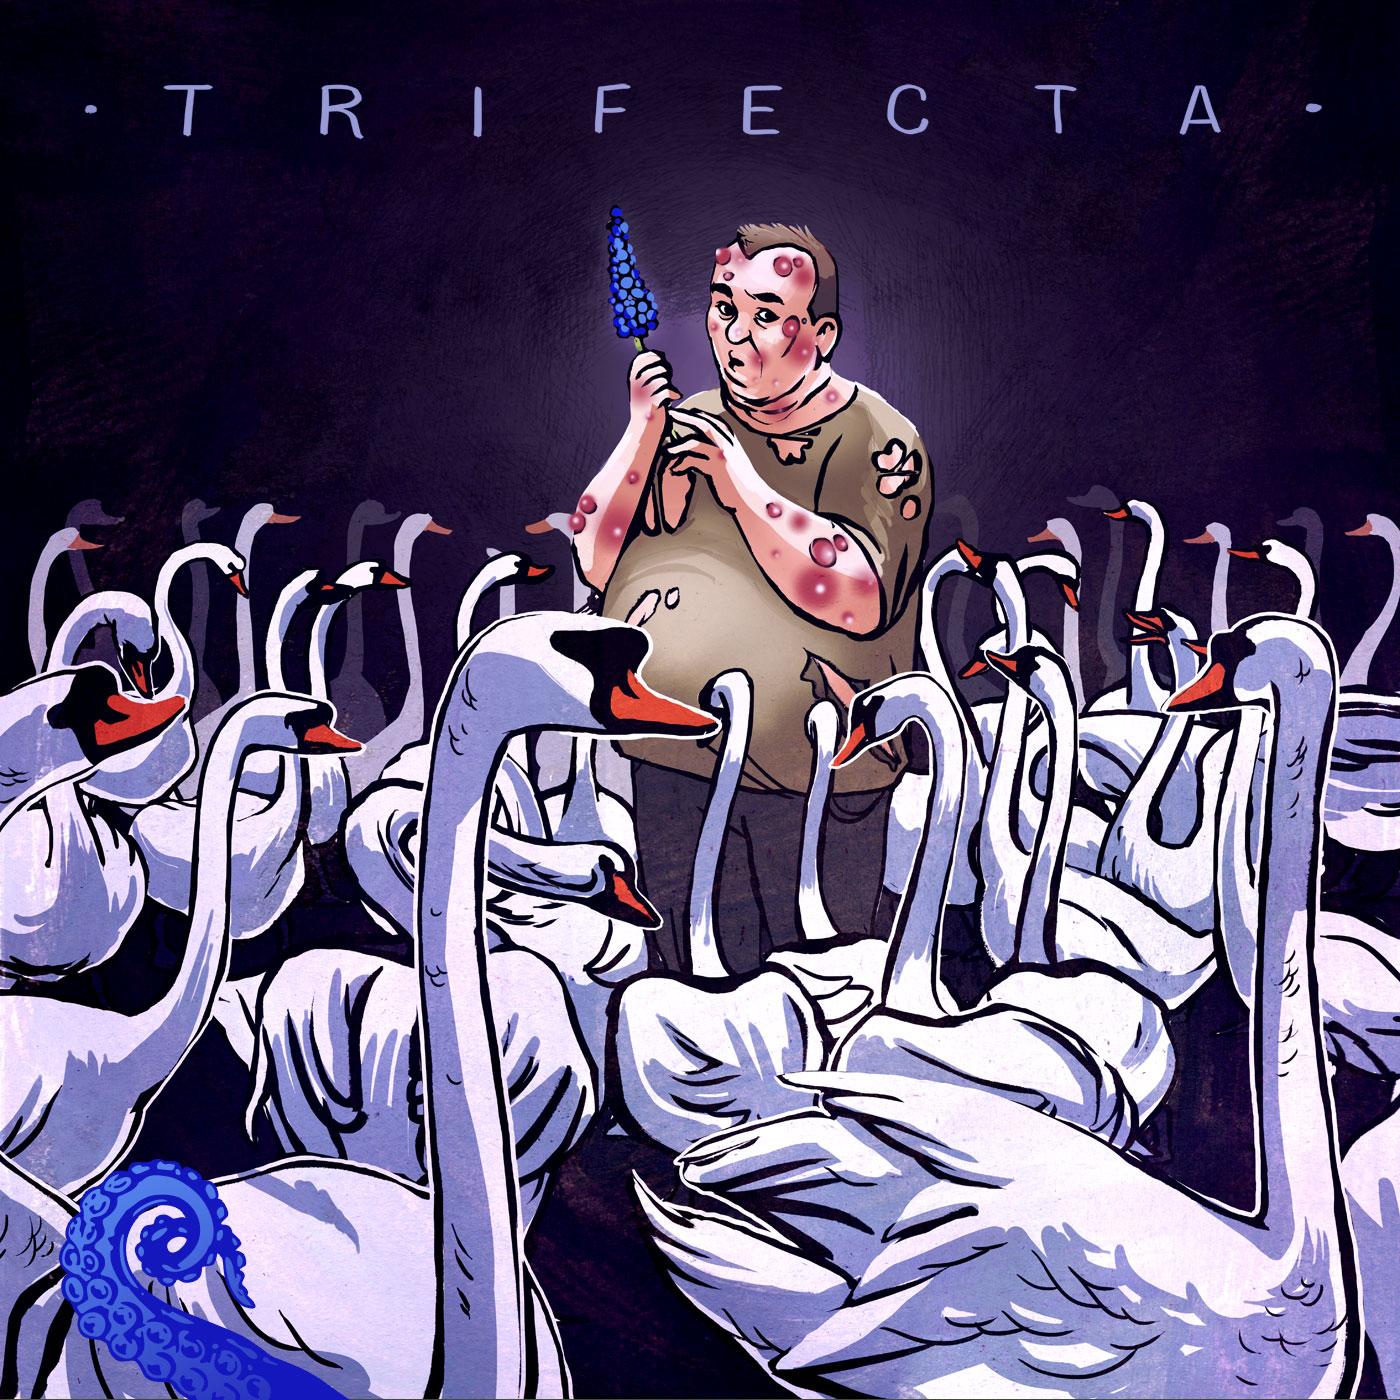 Cover for Drabblecast Trifecta by Unka Odya